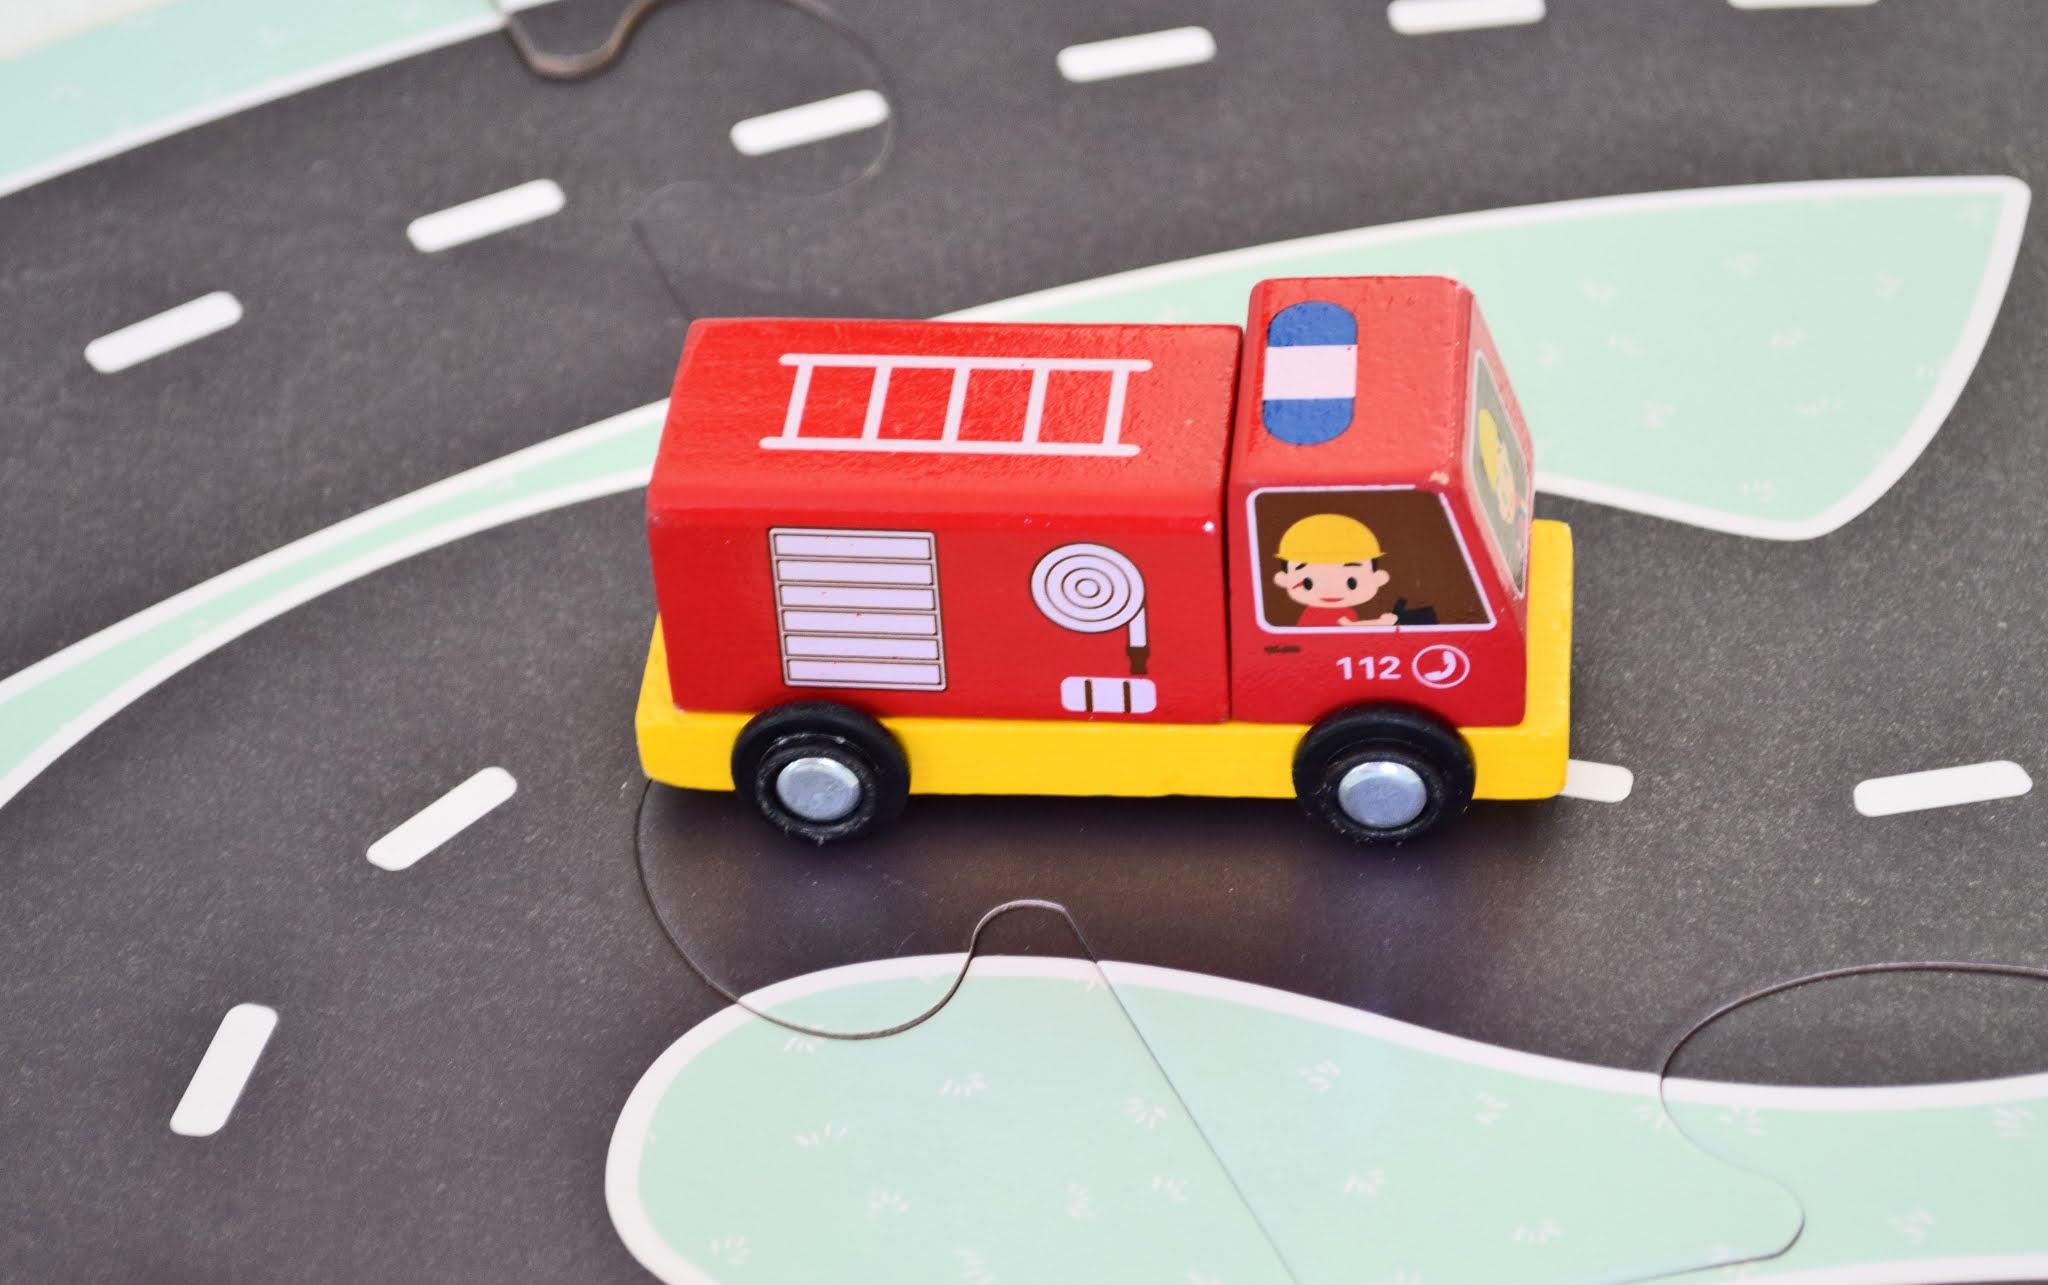 mata dywanik do zabawy droga ulica edukacyjna